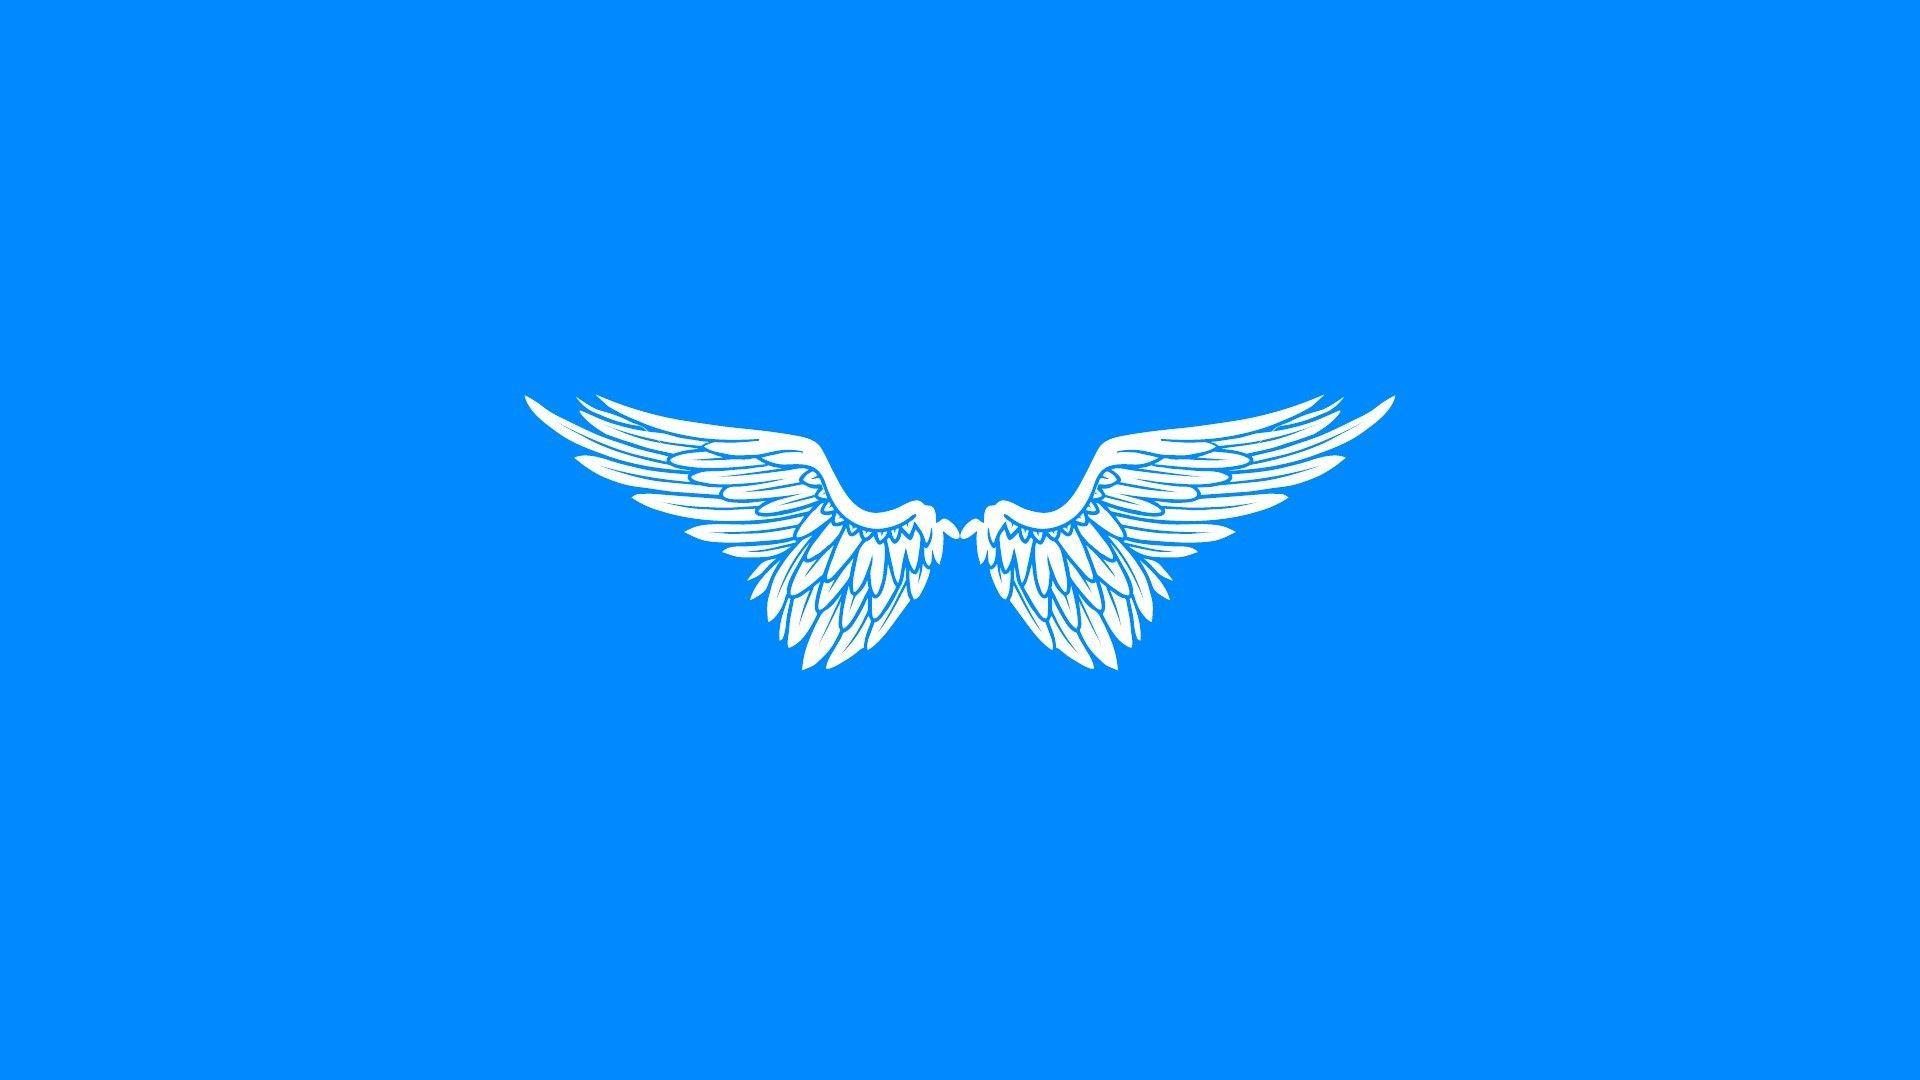 pin blue angels hd - photo #39